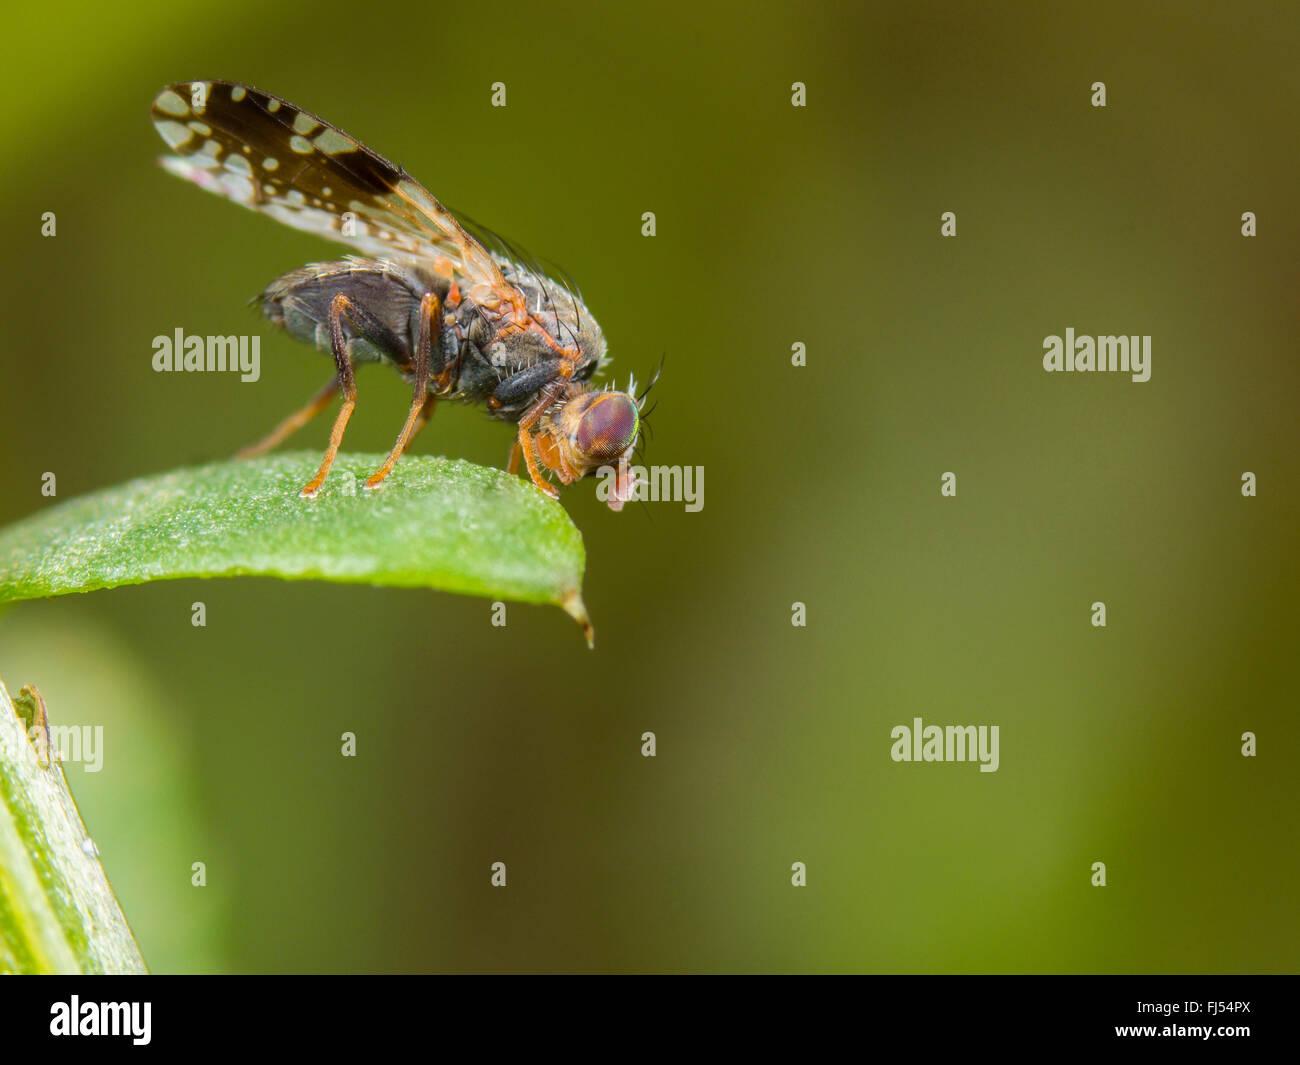 Tephritid fly (Tephritis neesii), male on ox-eye daisy (Leucanthemum vulgare), Germany Stock Photo